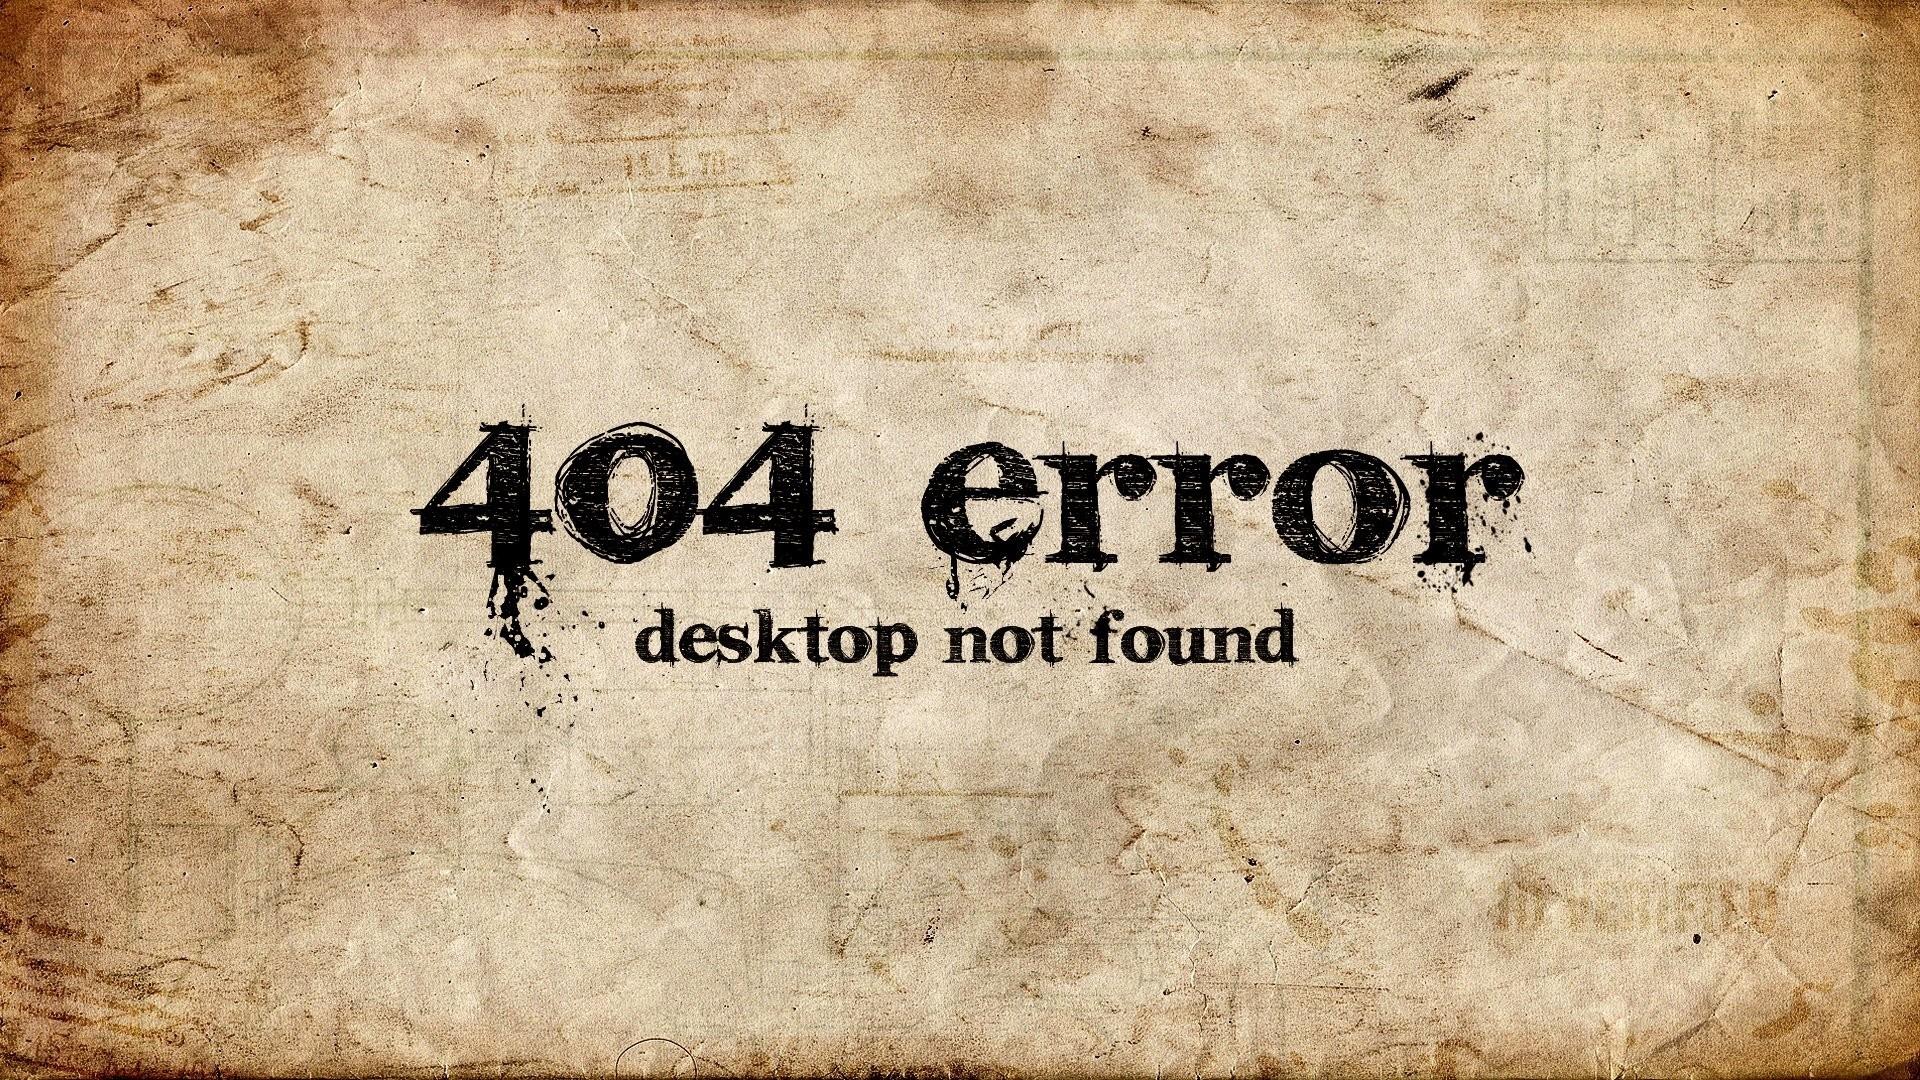 Error 404 computer wallpaper